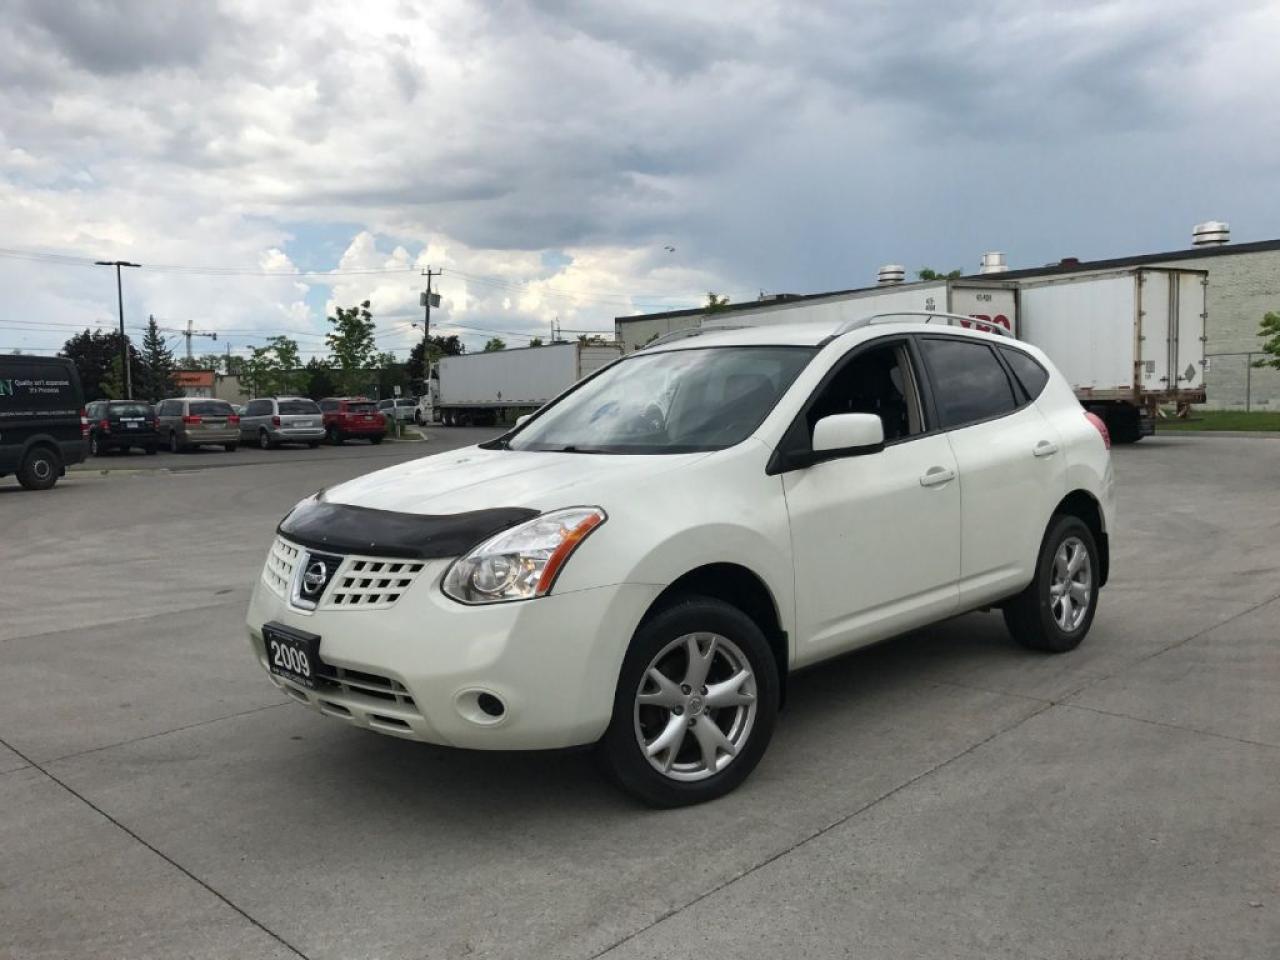 2009 Nissan Rogue Autoamitce, SUV, 3 years warranty available